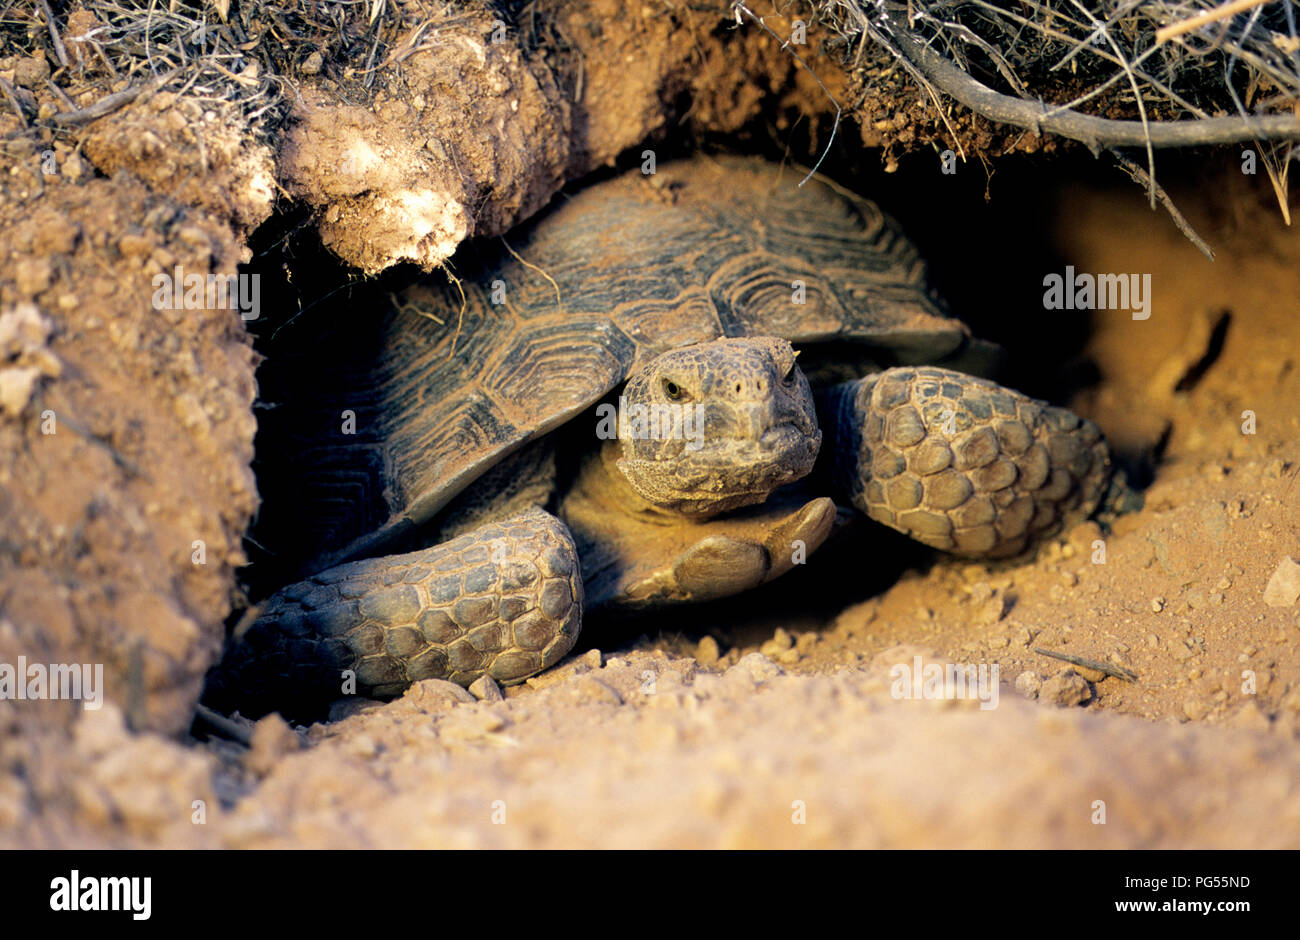 Desert tortoise (Gopherus agassizii) in burrow at Red Cliffs Desert Reserve in SW Utah - Stock Image